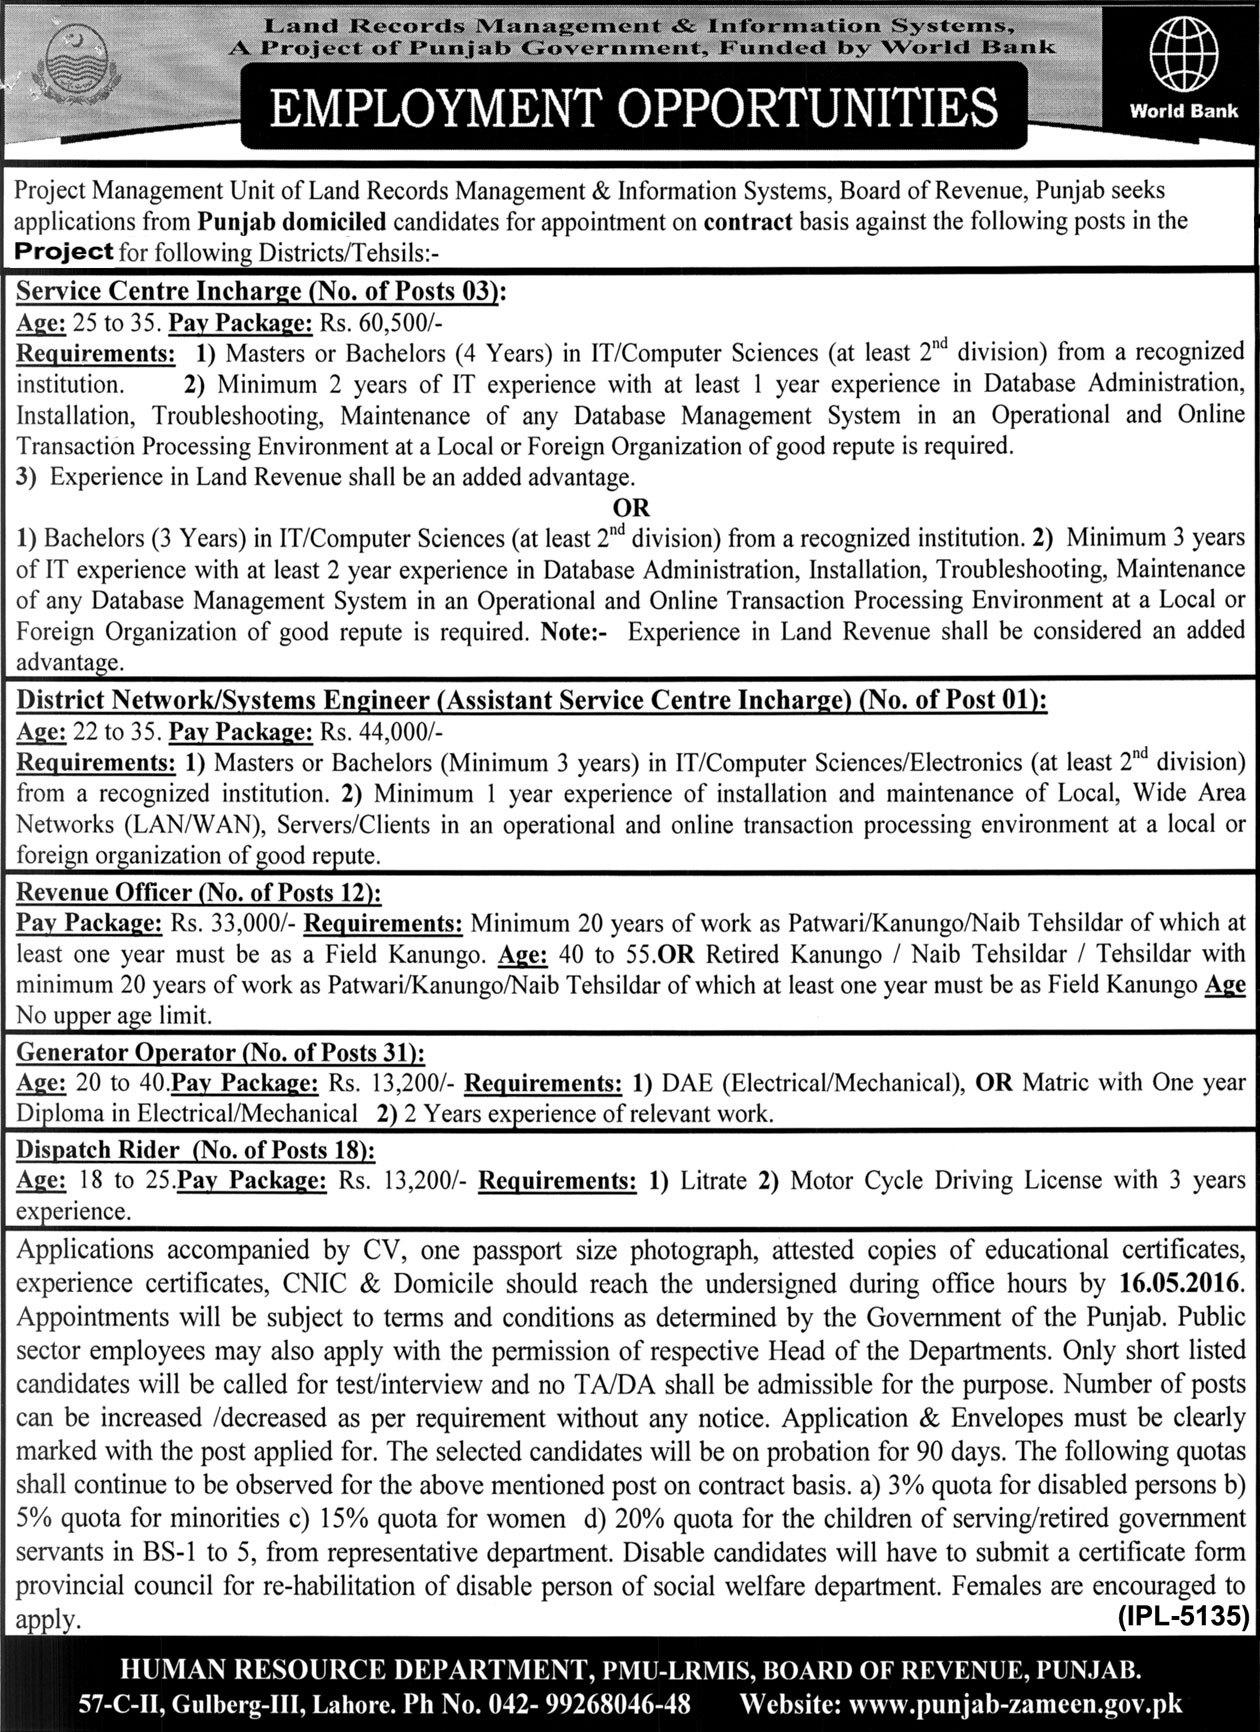 Generator Operator Job Punjab Revenue Department Job Service Centre Incharge Revenue Officer Jobs 2016